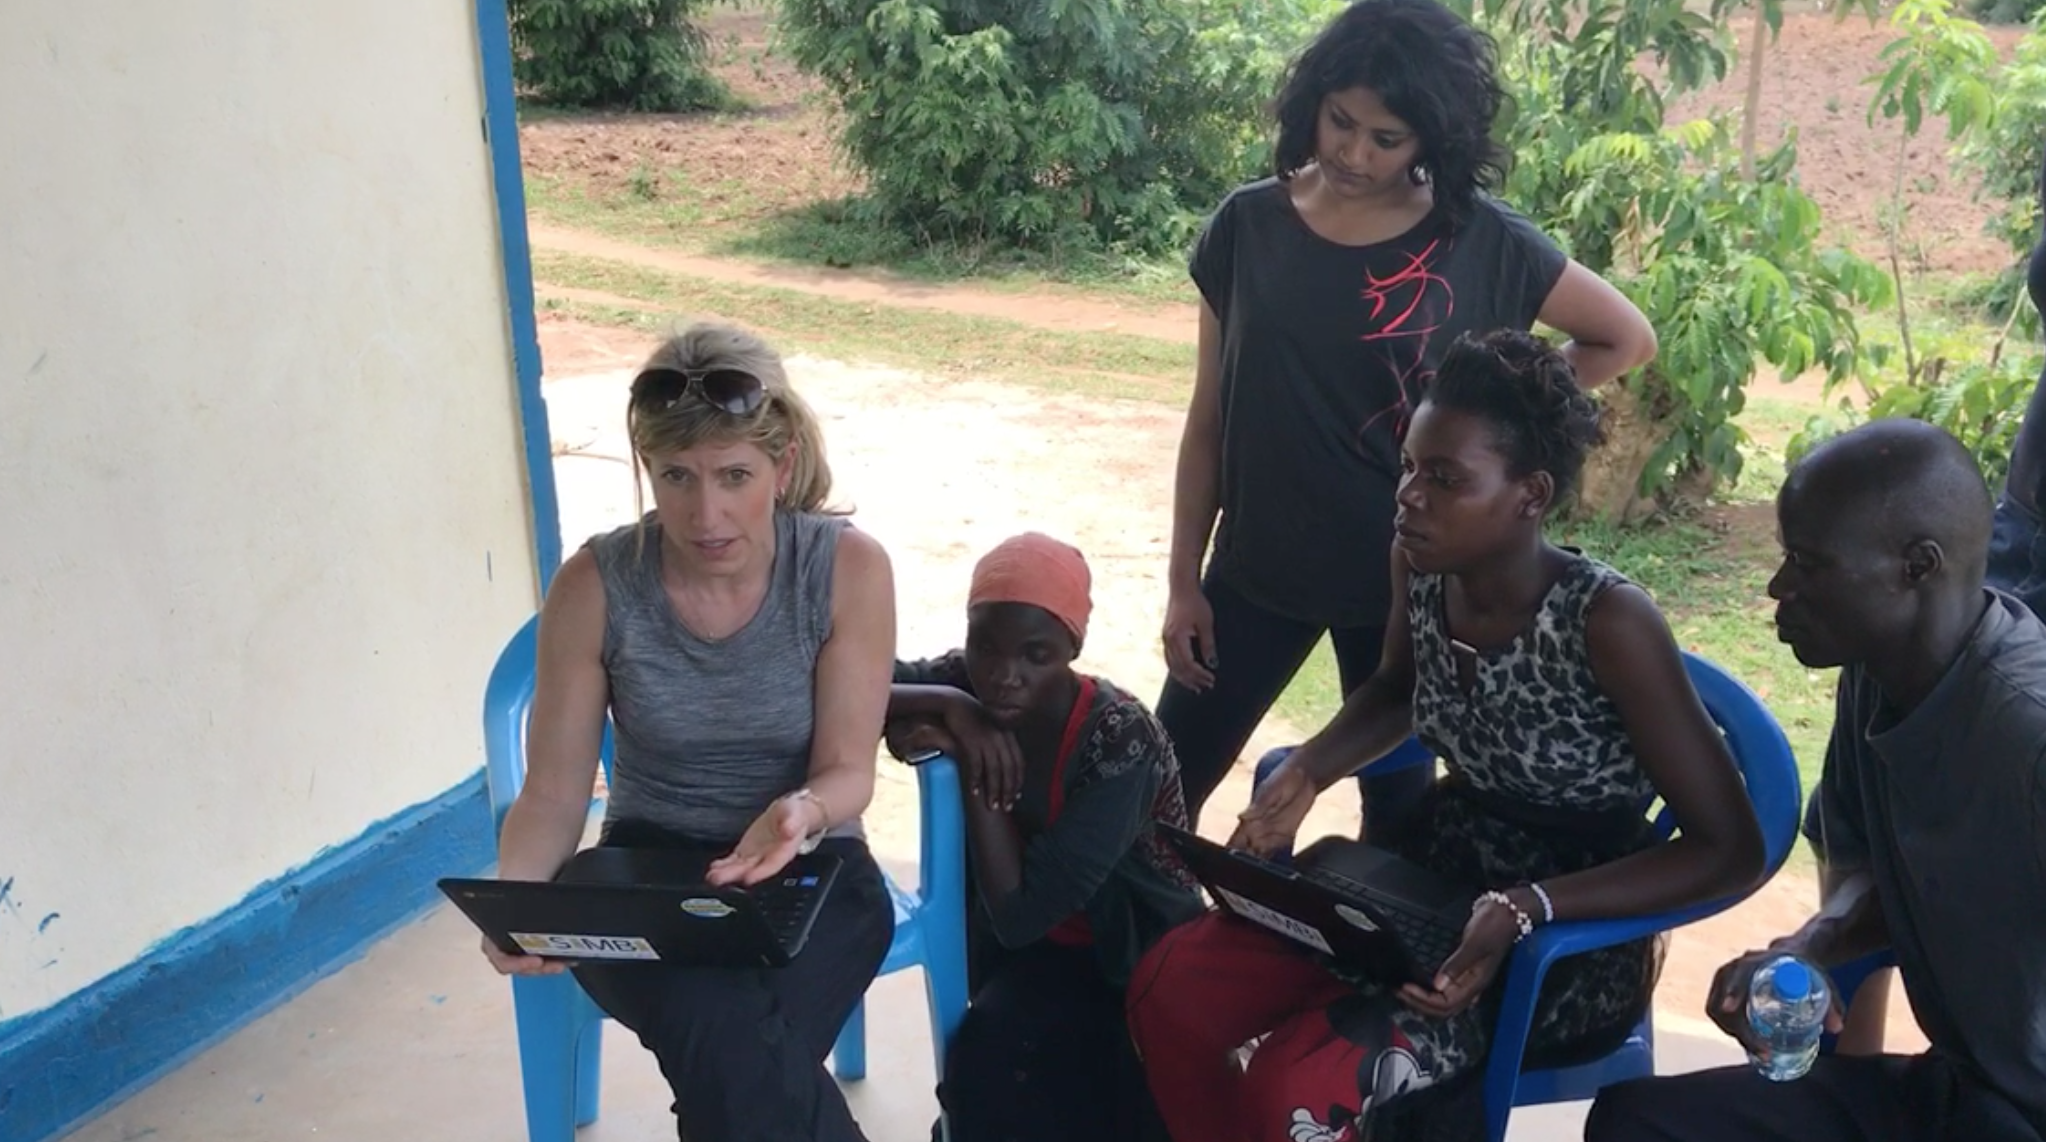 Nicole teaching teachers from Yonatan Netanyahu Memorial School how to use SiMBi - our reading app.